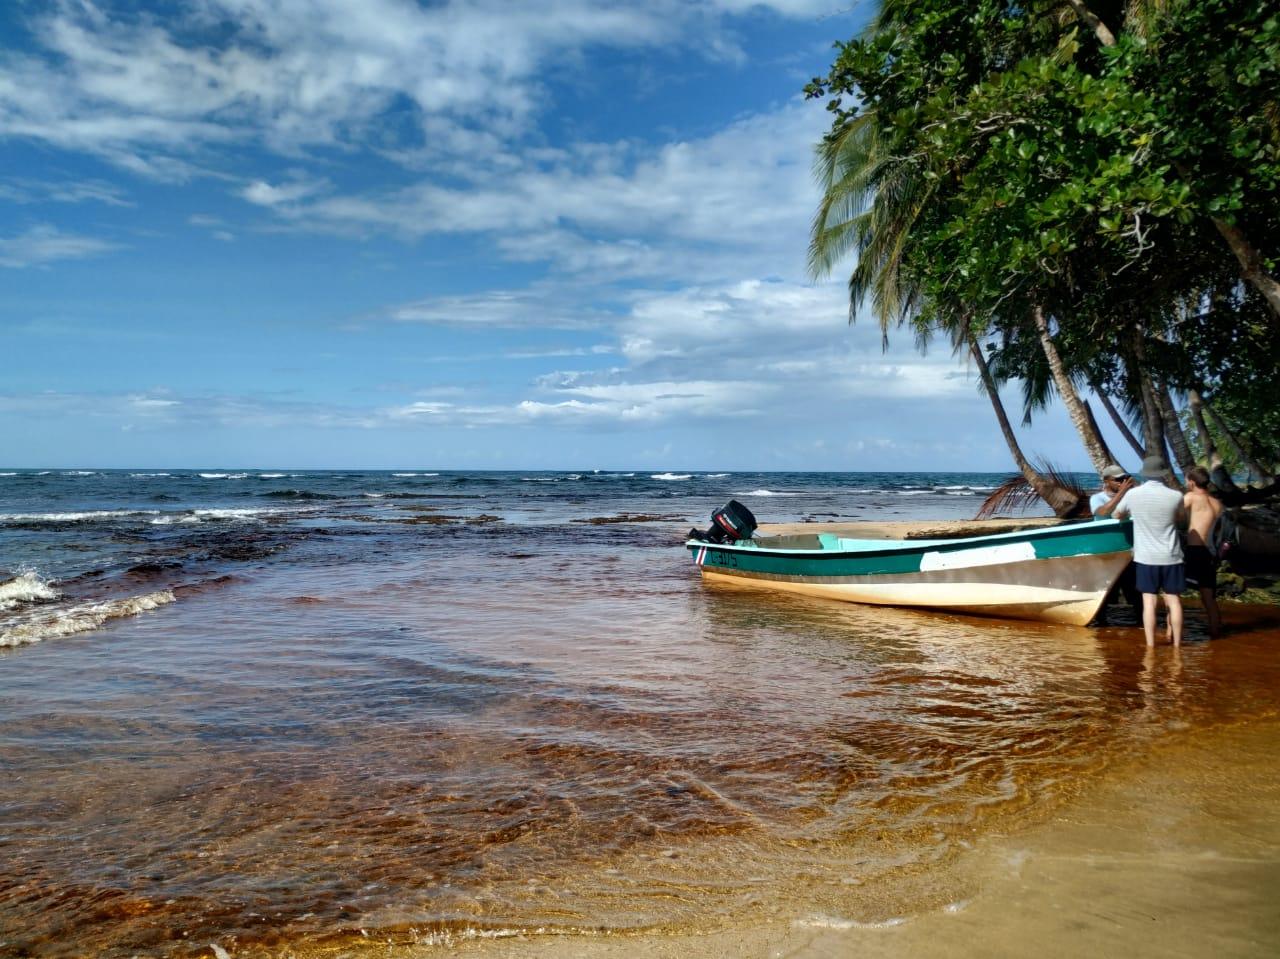 Playa-Manzanillo-Puerto-Viejo